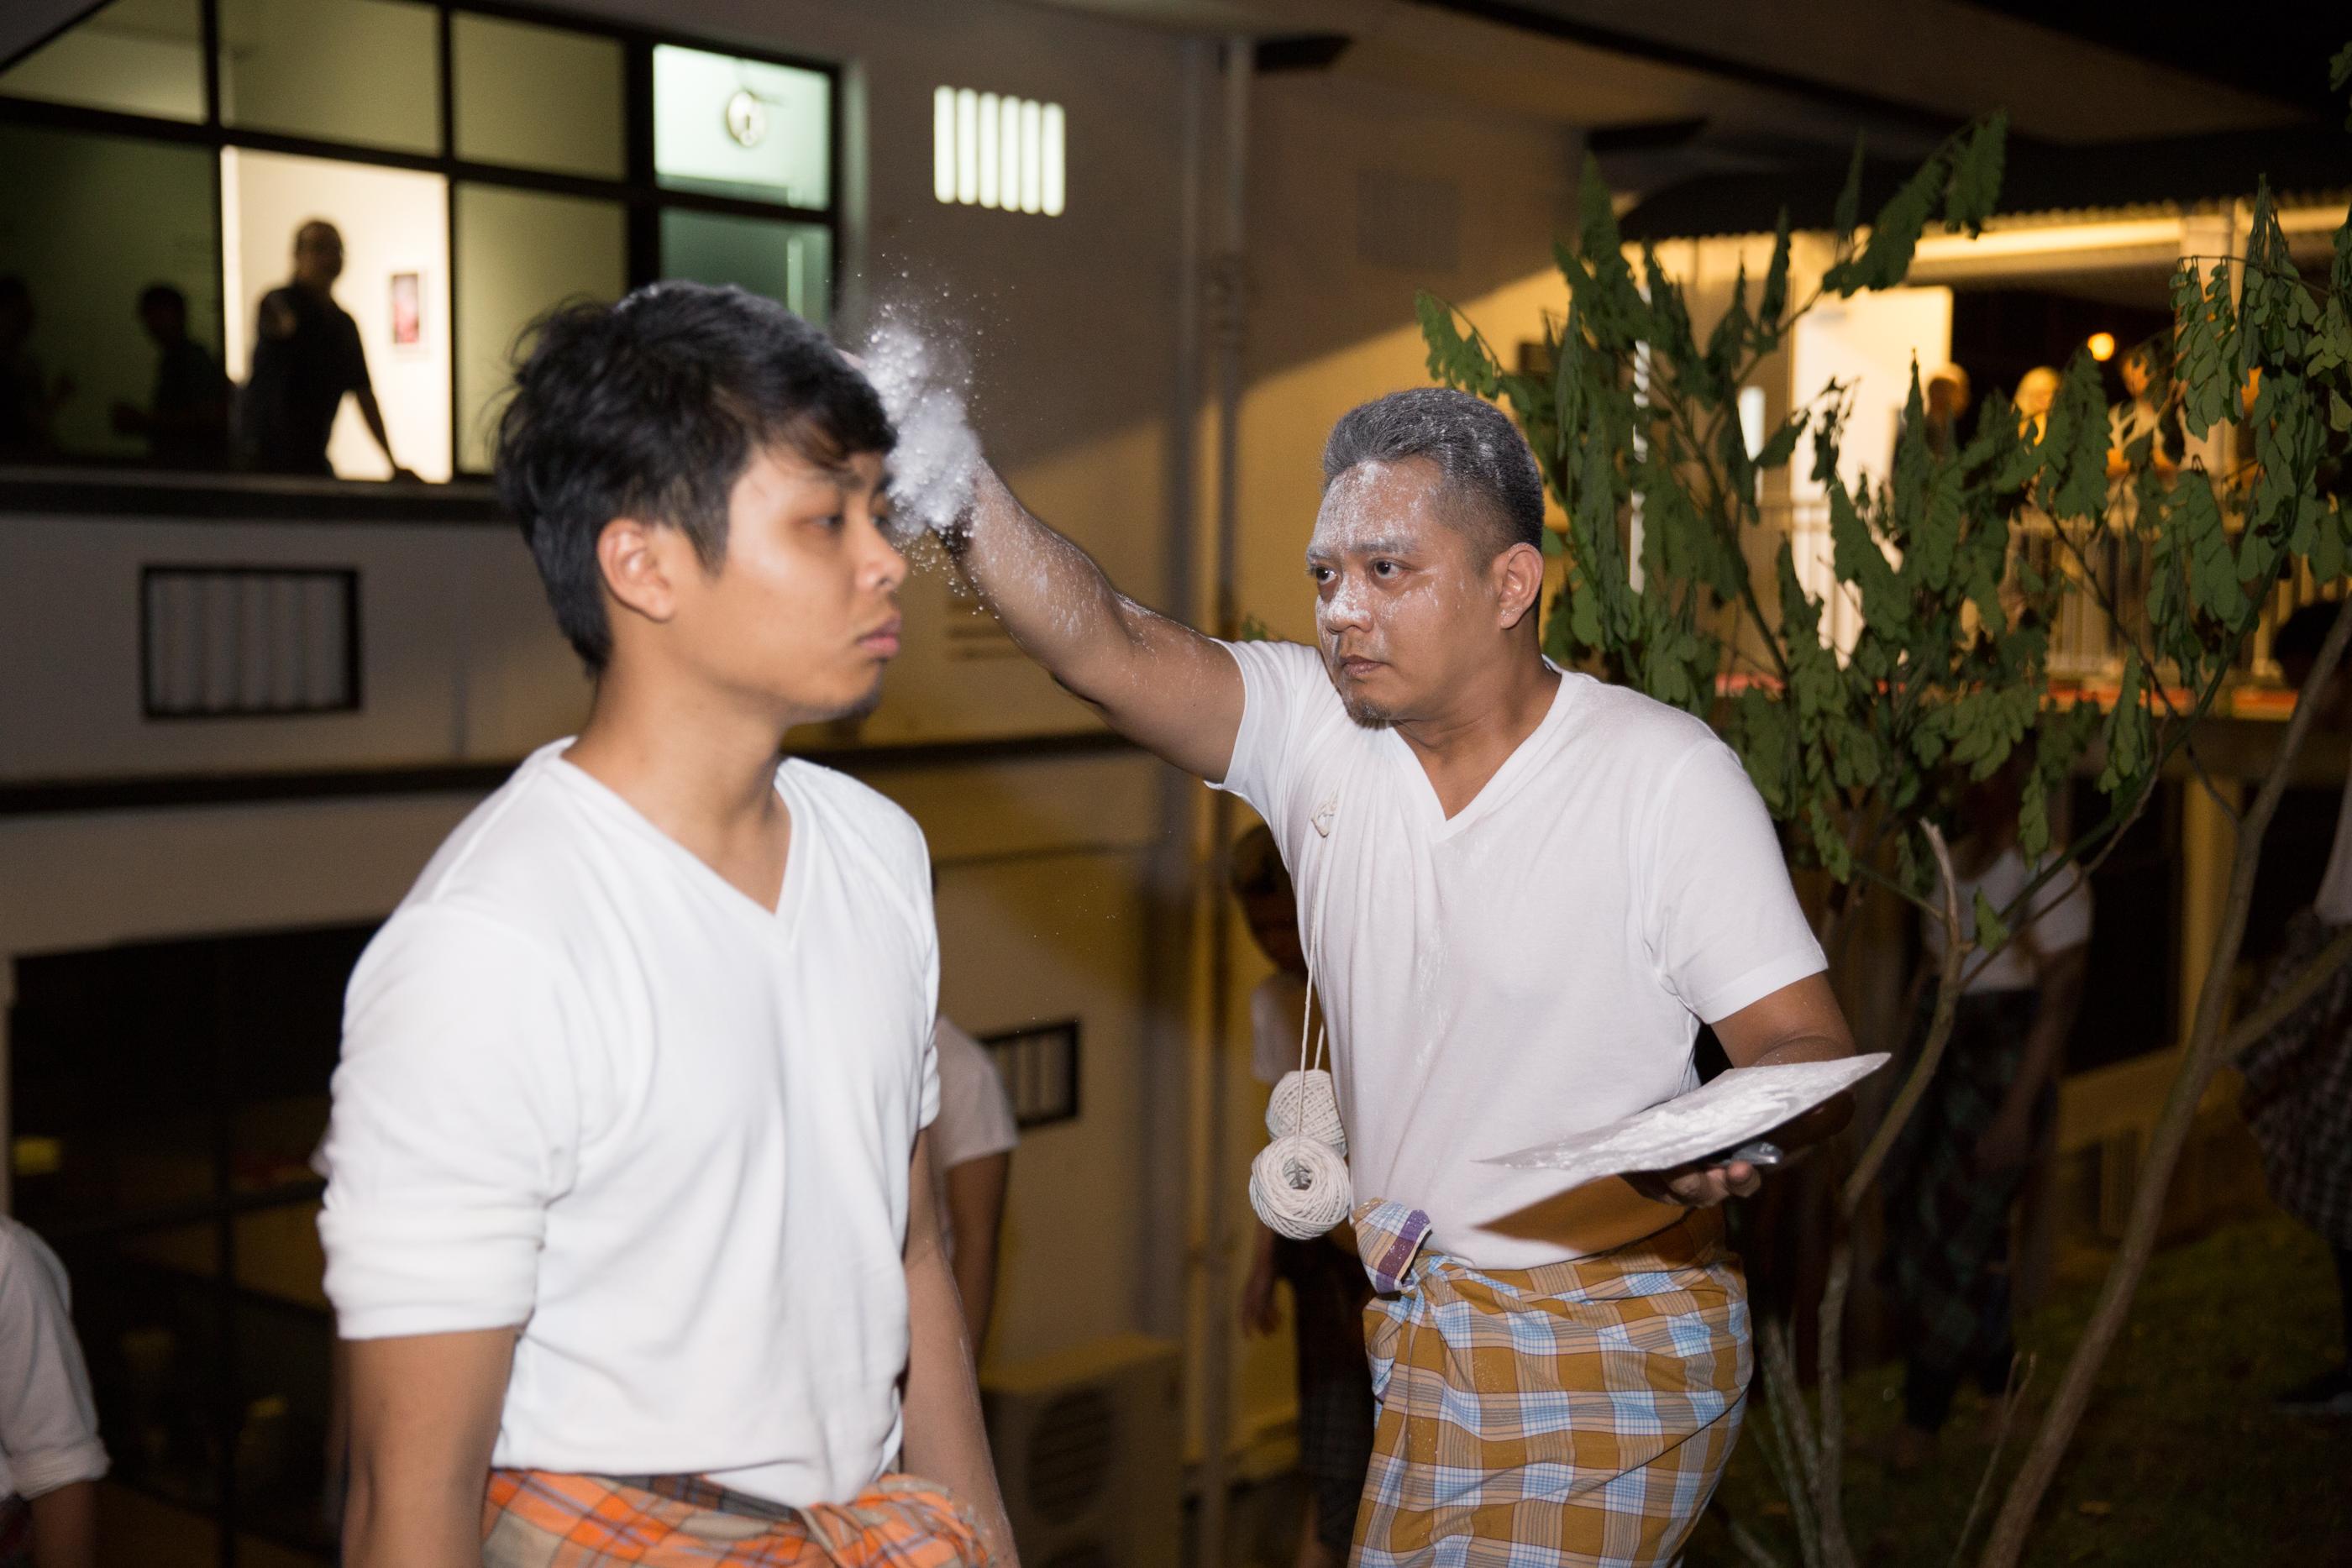 Asia Nightlife Concert Photographer